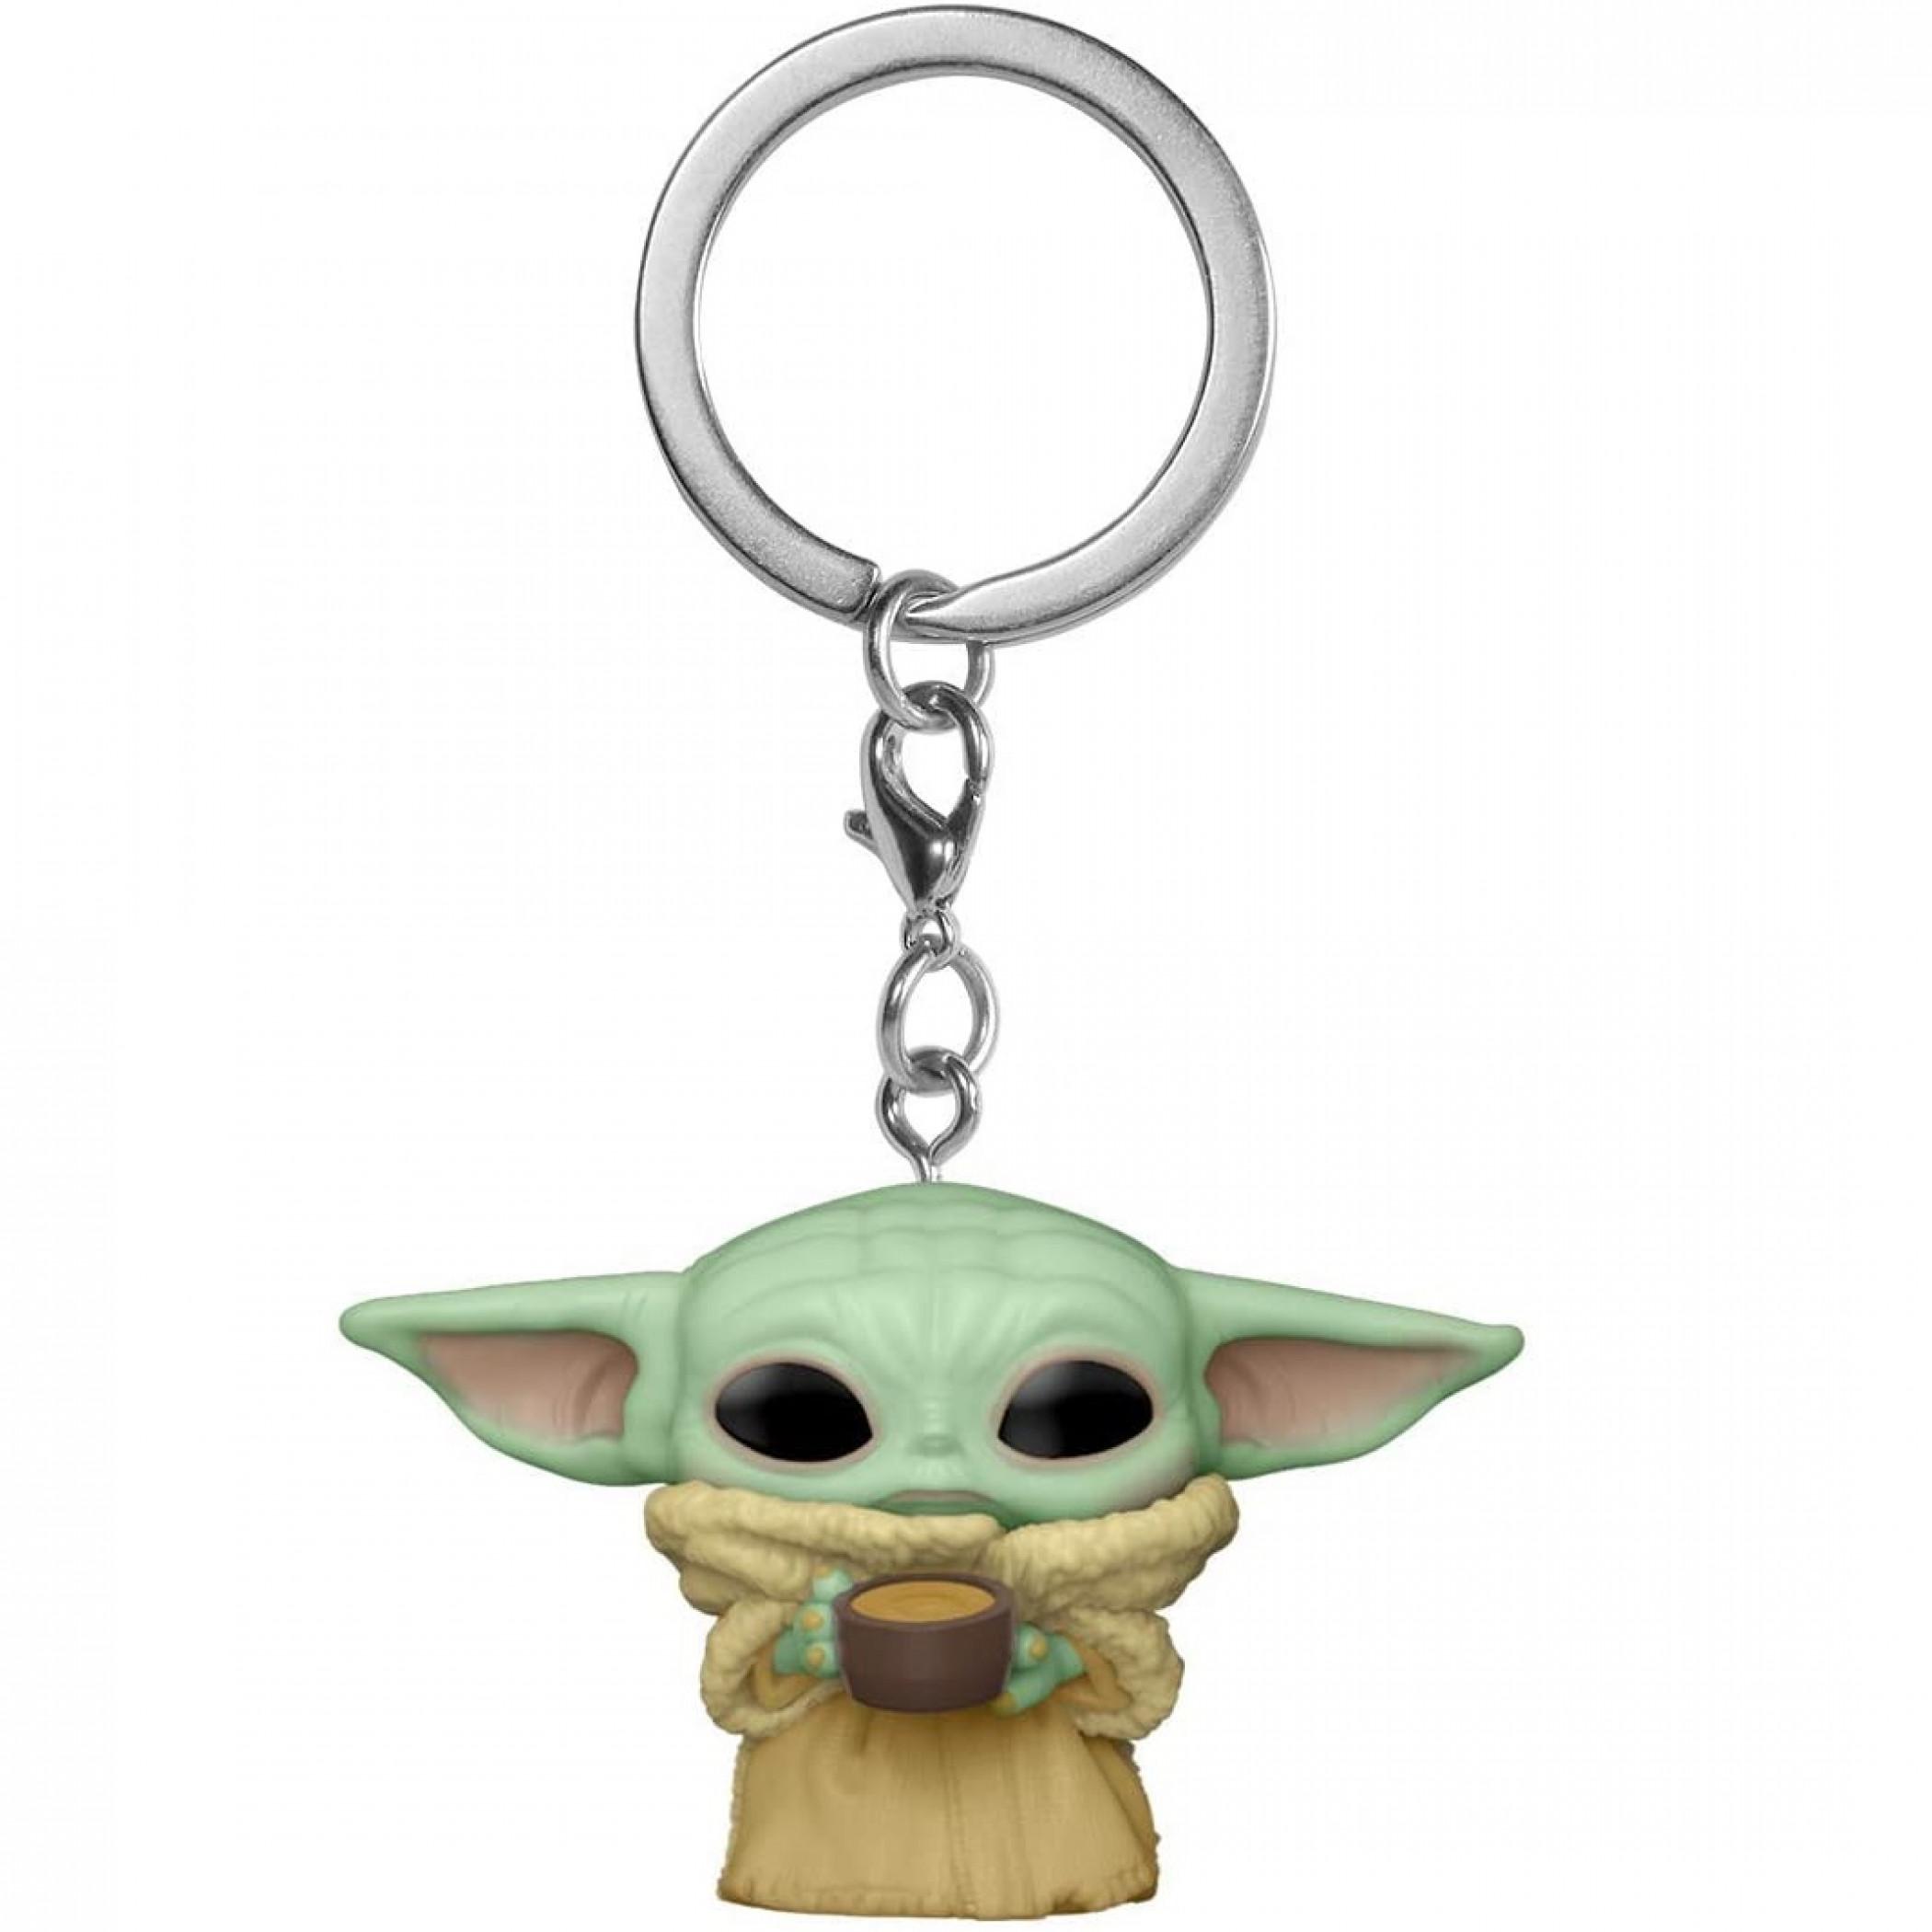 Star Wars The Mandalorian Grogu Child with Cup Funko Pop! Keychain